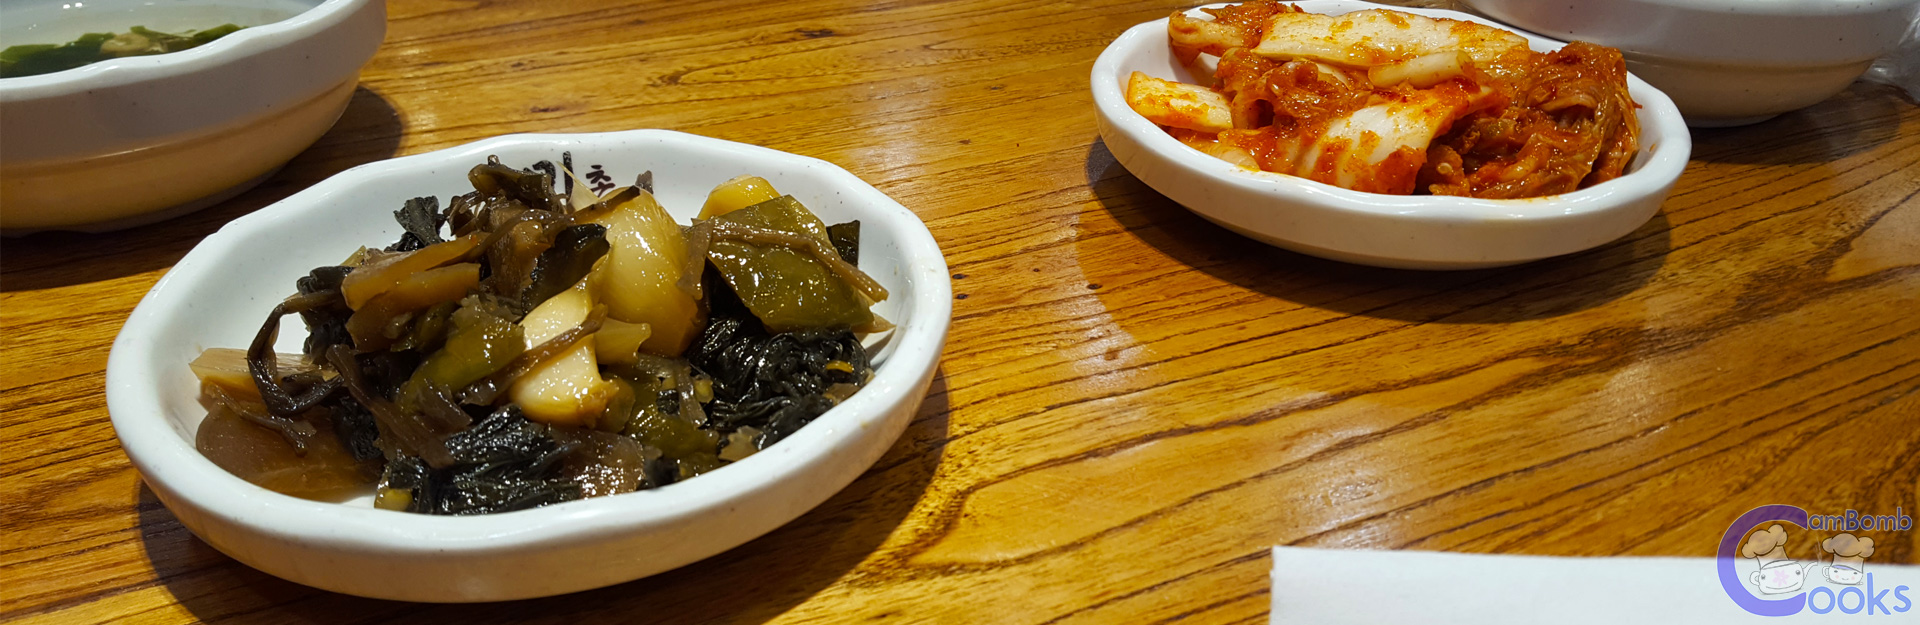 Pickled Garlic and Kimchi